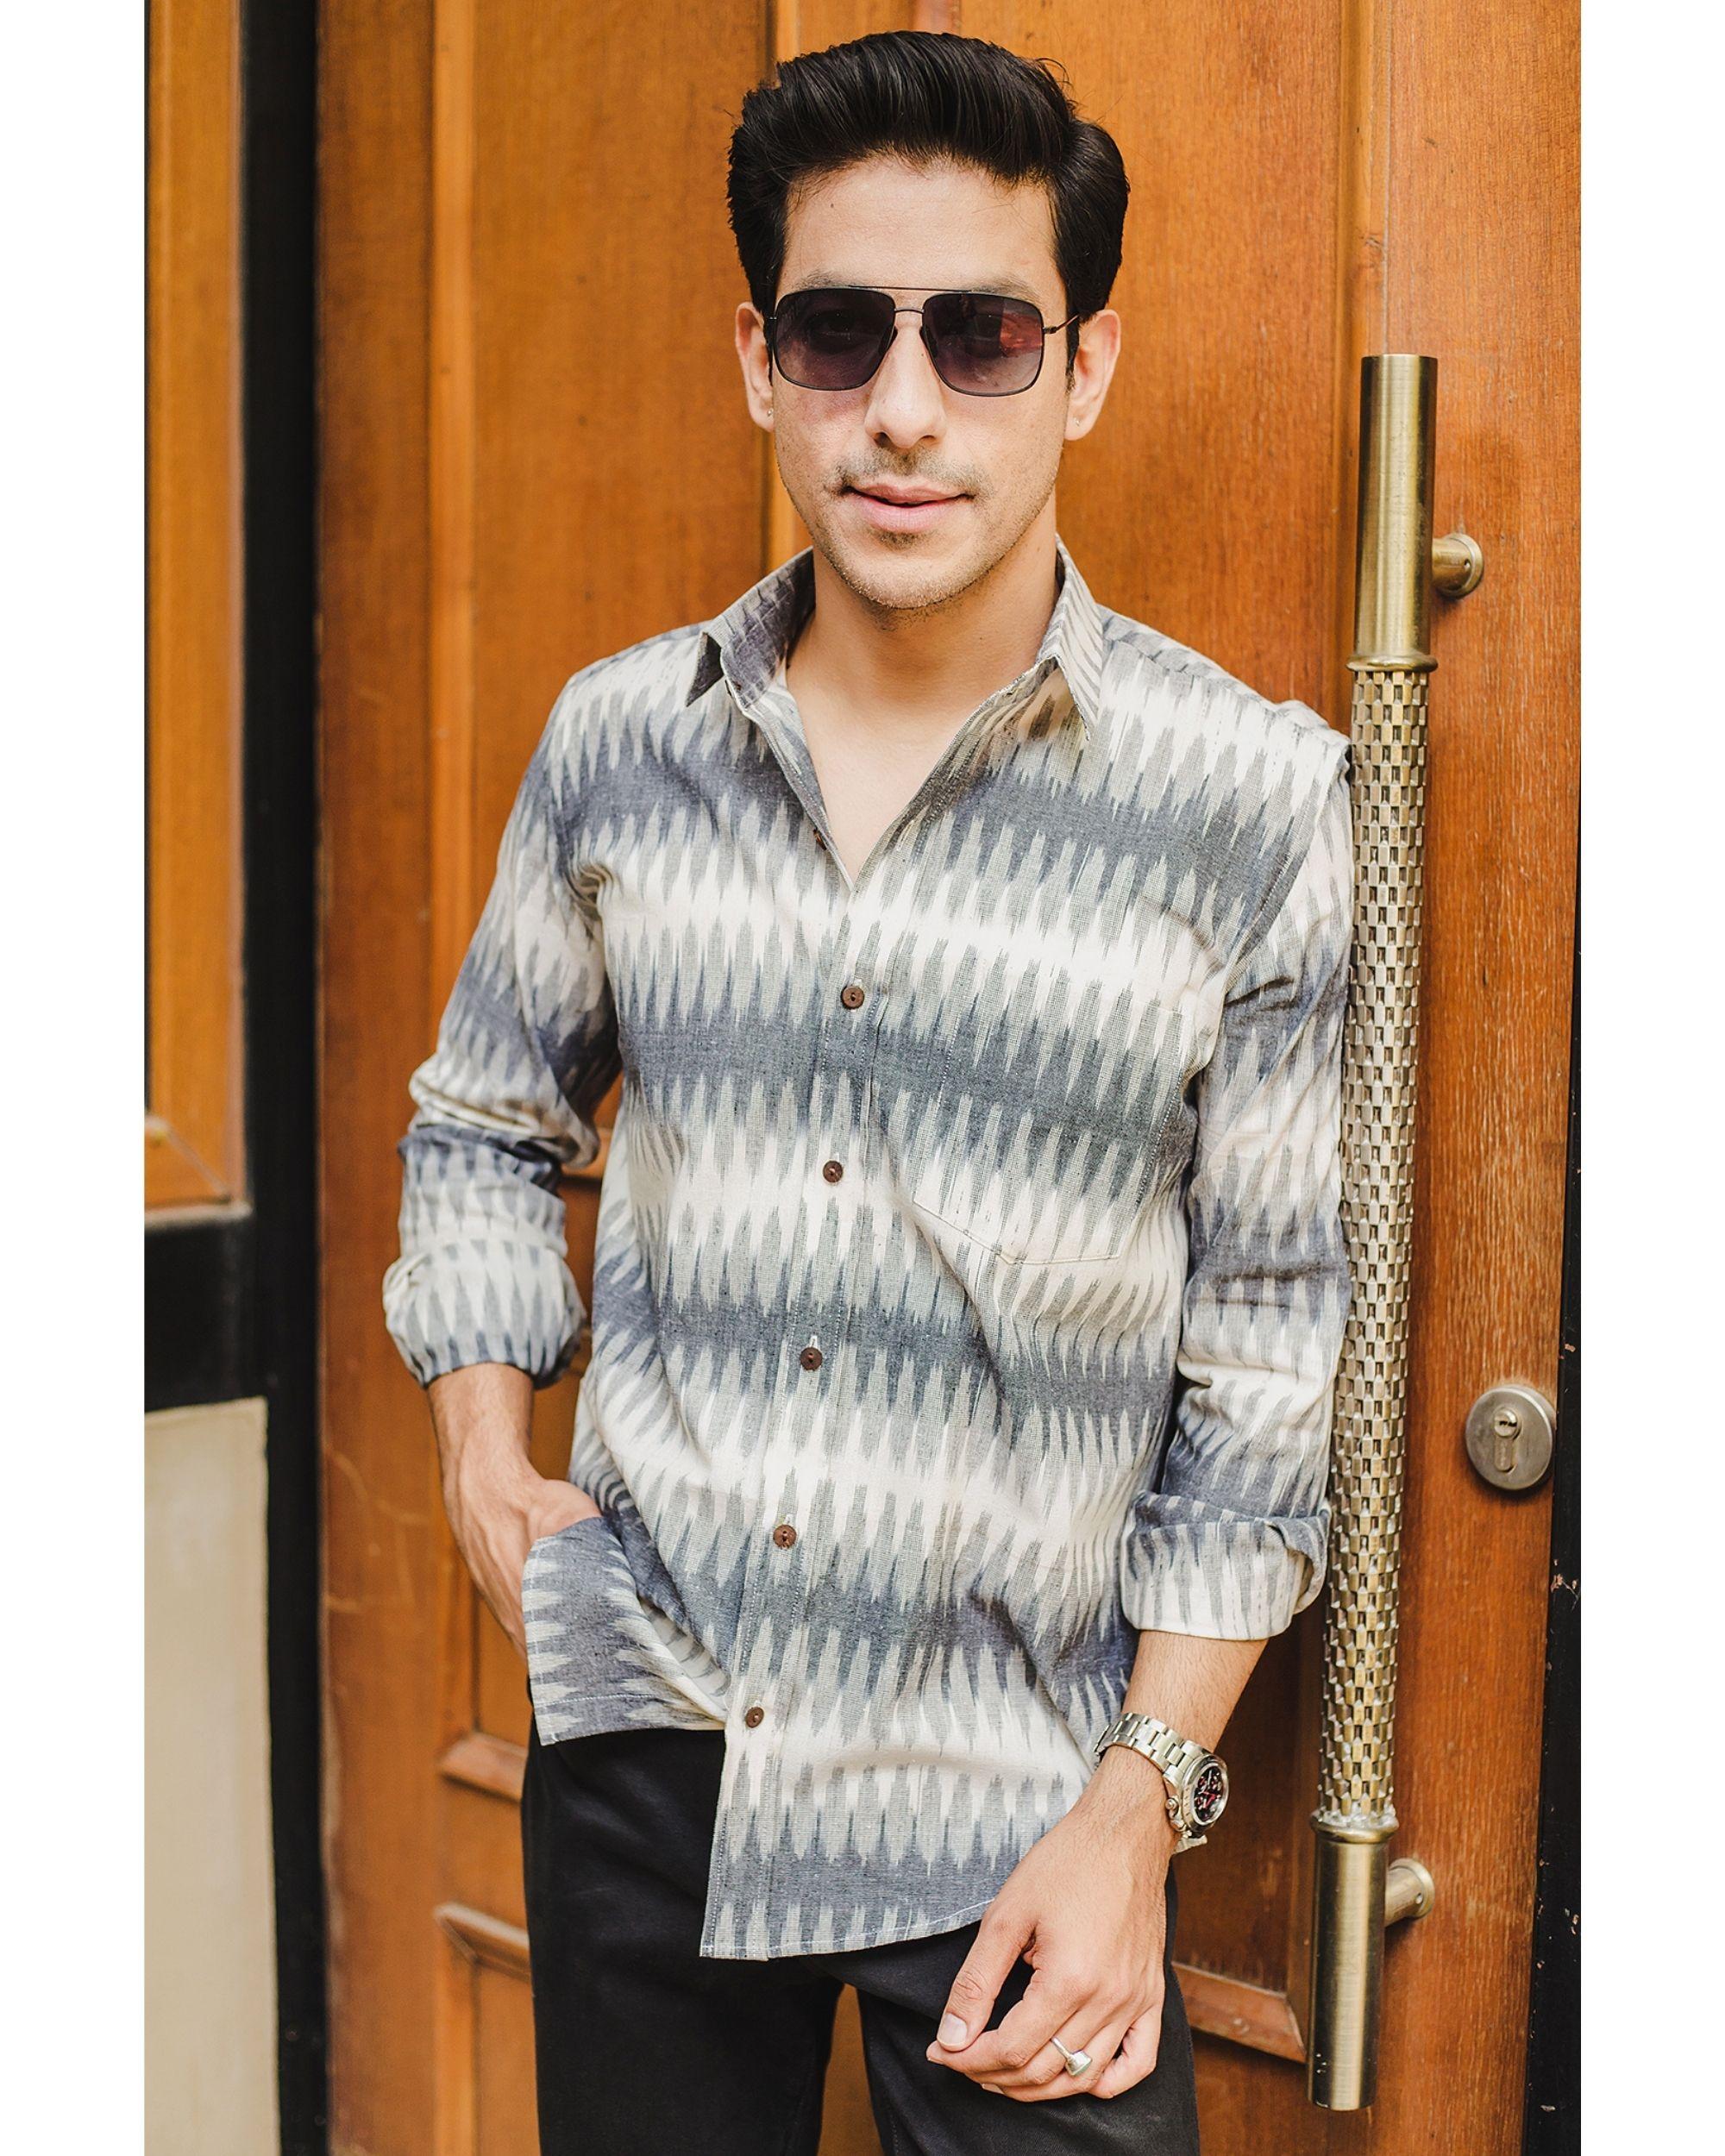 Grey and white ikat woven shirt